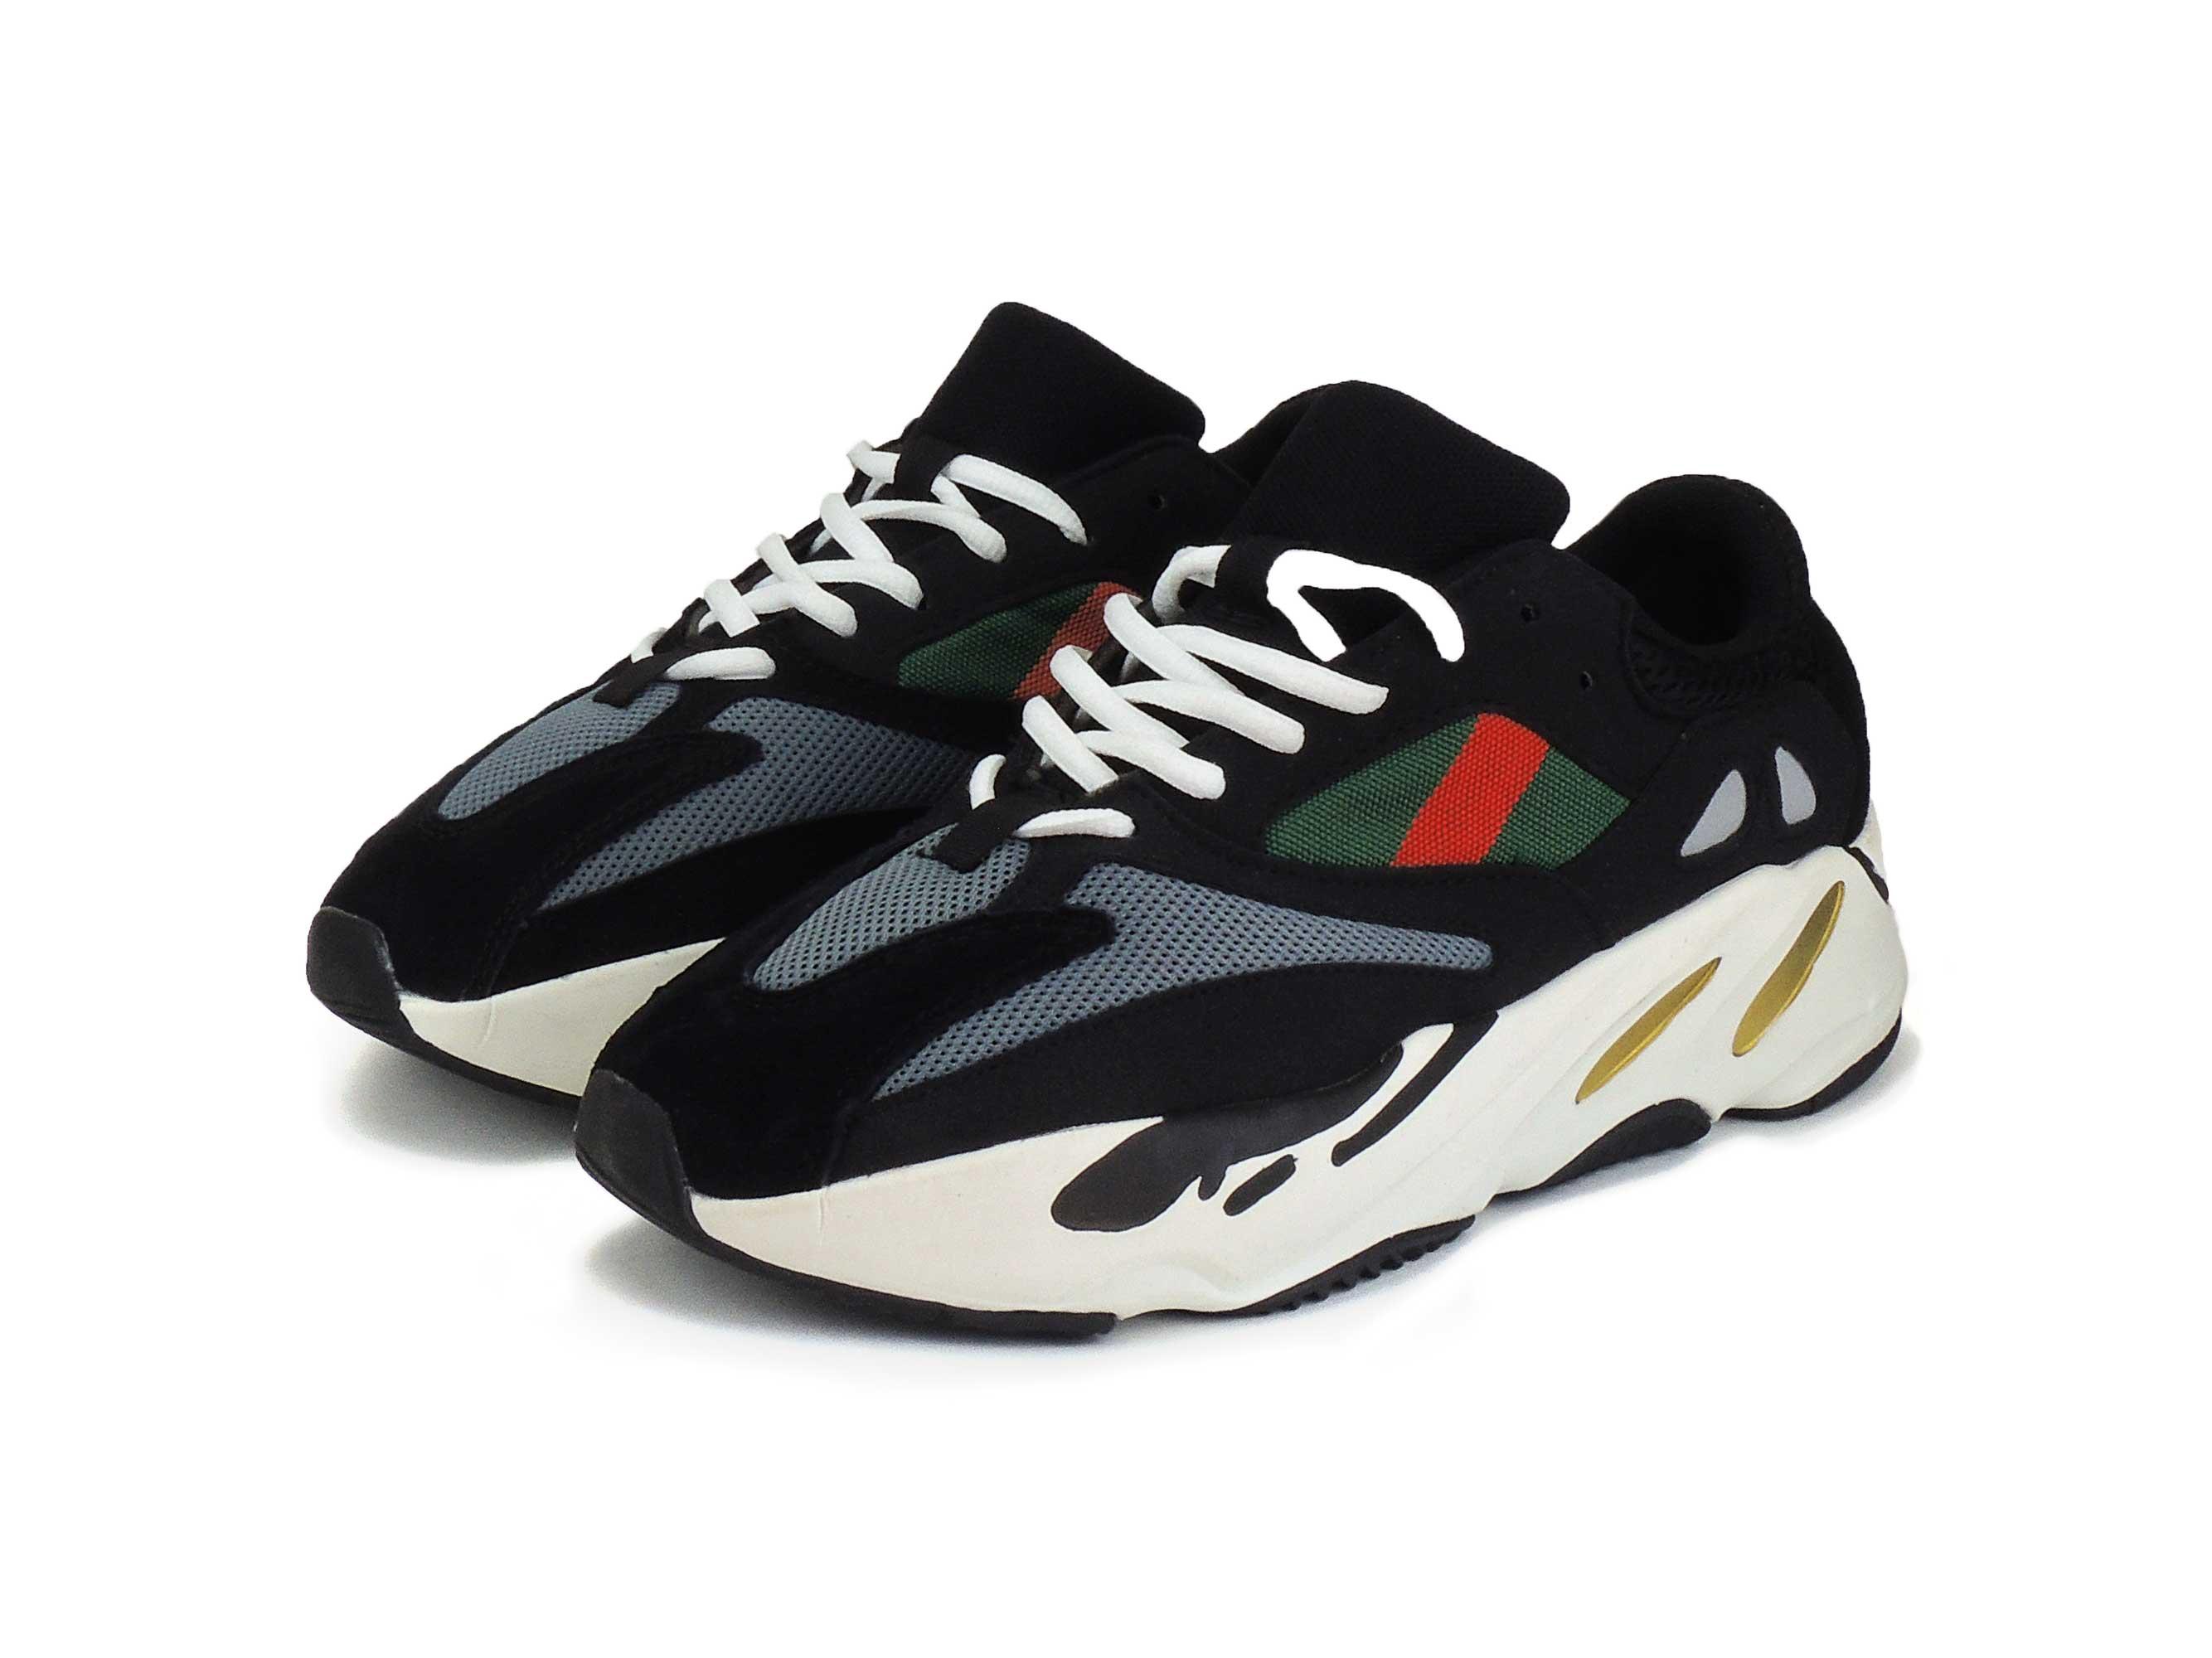 watch 7d938 b04e4 adidas yeezy 700 boost wave runner black white